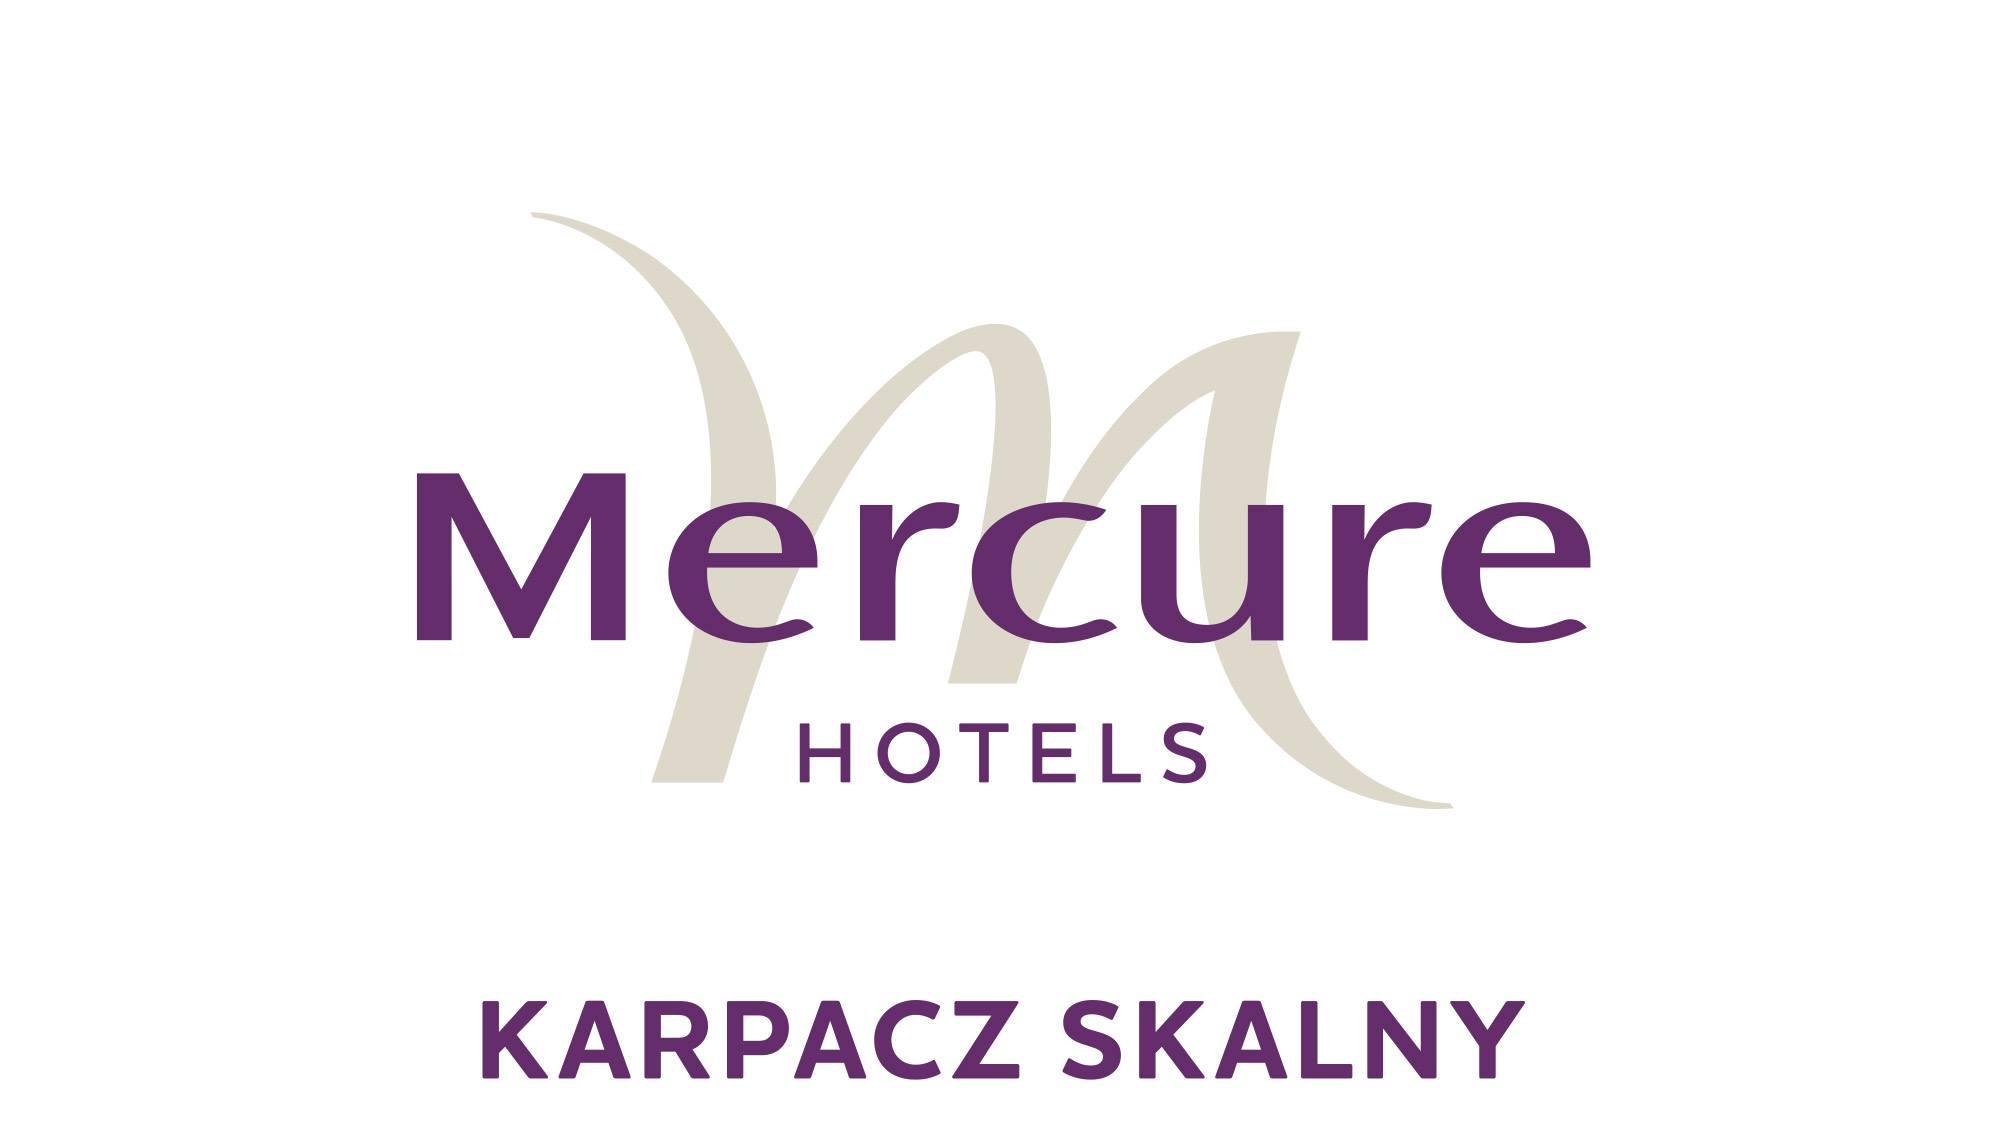 Mercure Karpacz Skalny